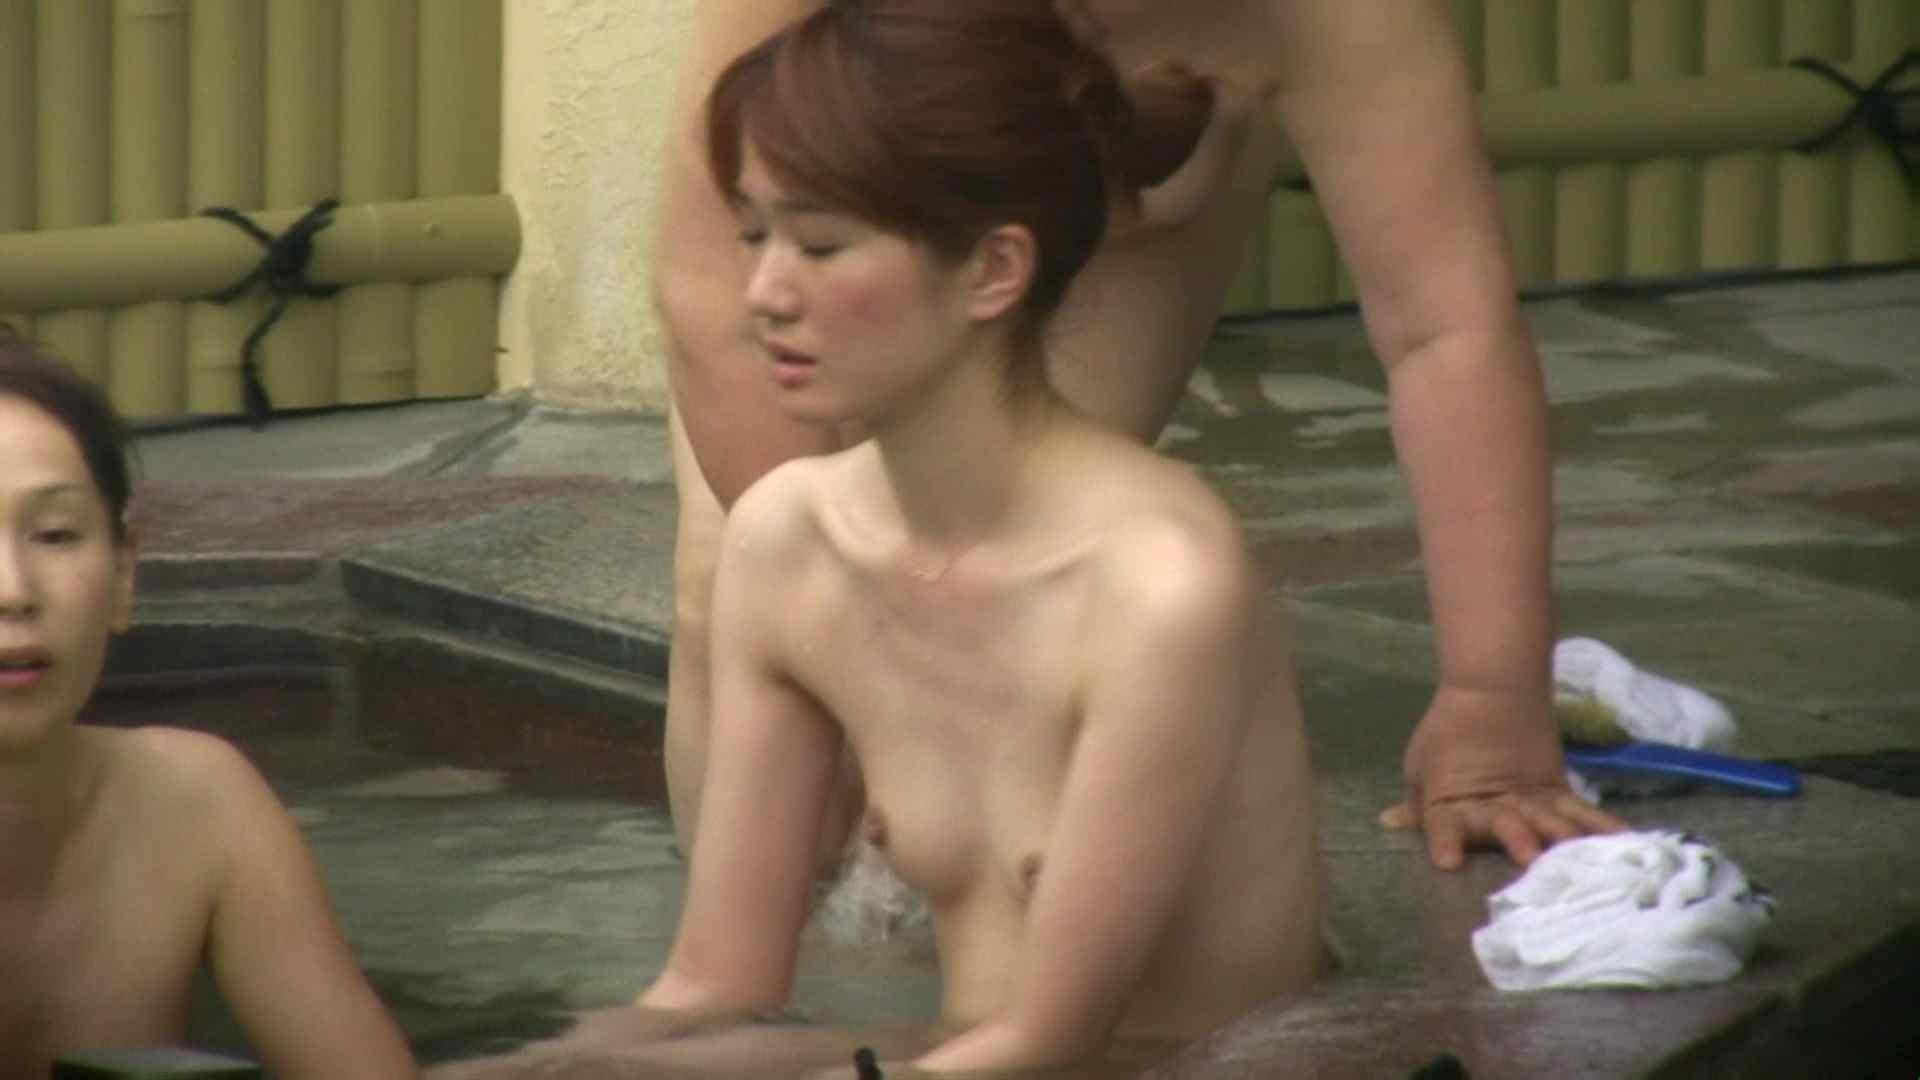 Aquaな露天風呂Vol.110 HなOL | 盗撮  71pic 31